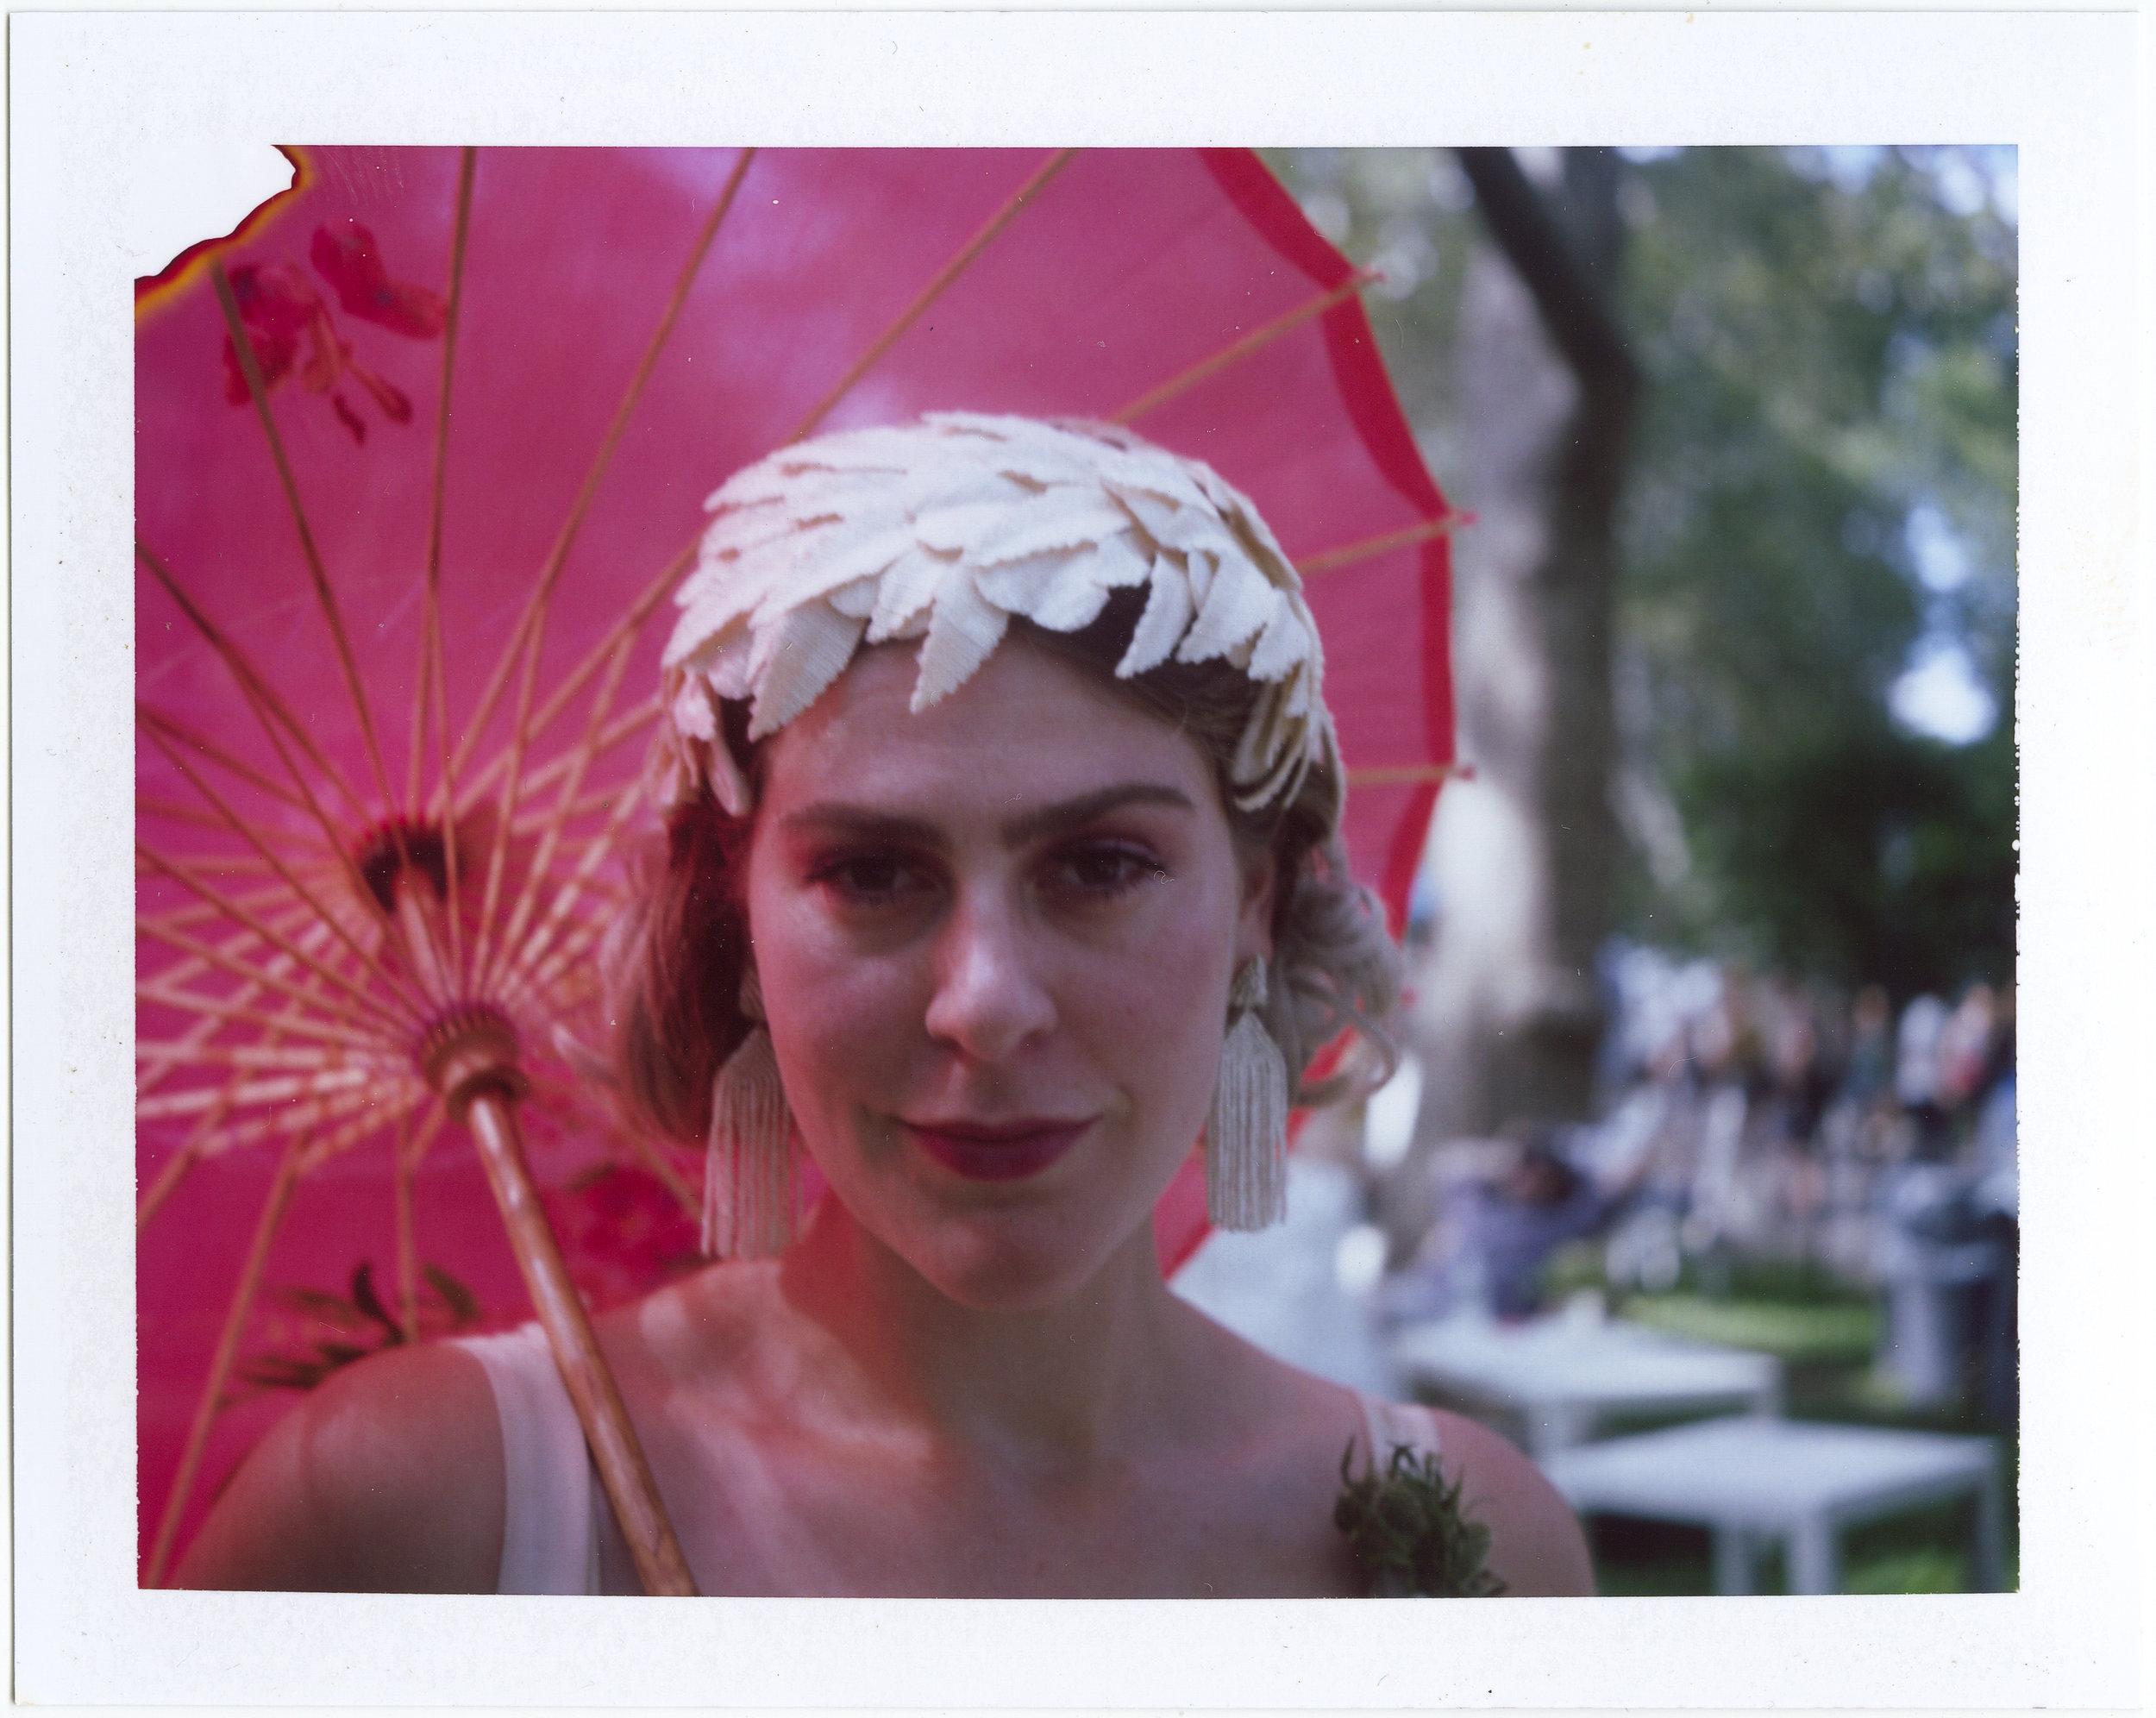 Polaroid Land 250 | Fujifilm FP-100C